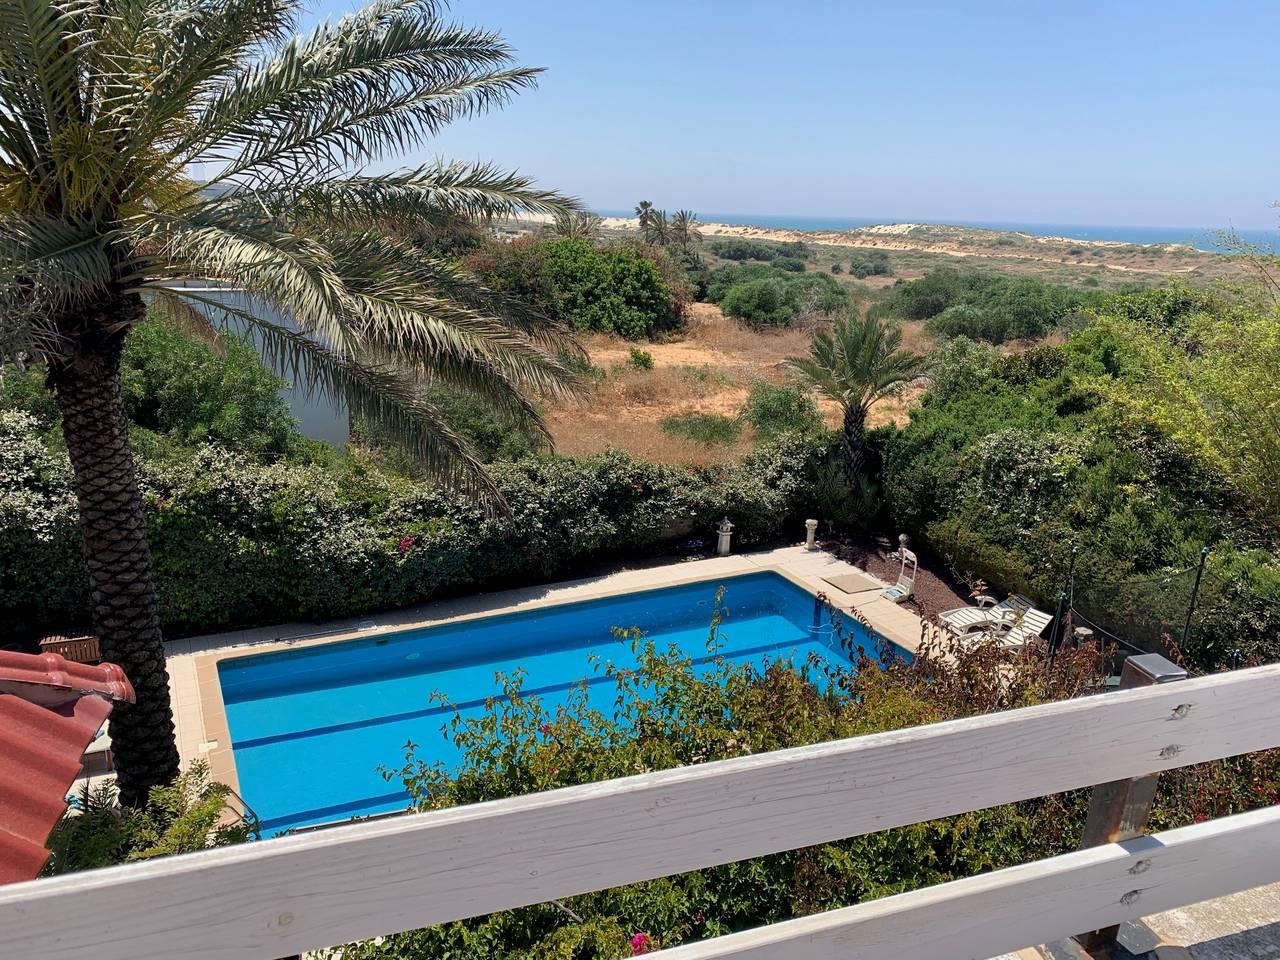 Apartment Dream house by the sea in Caesarea photo 25979678